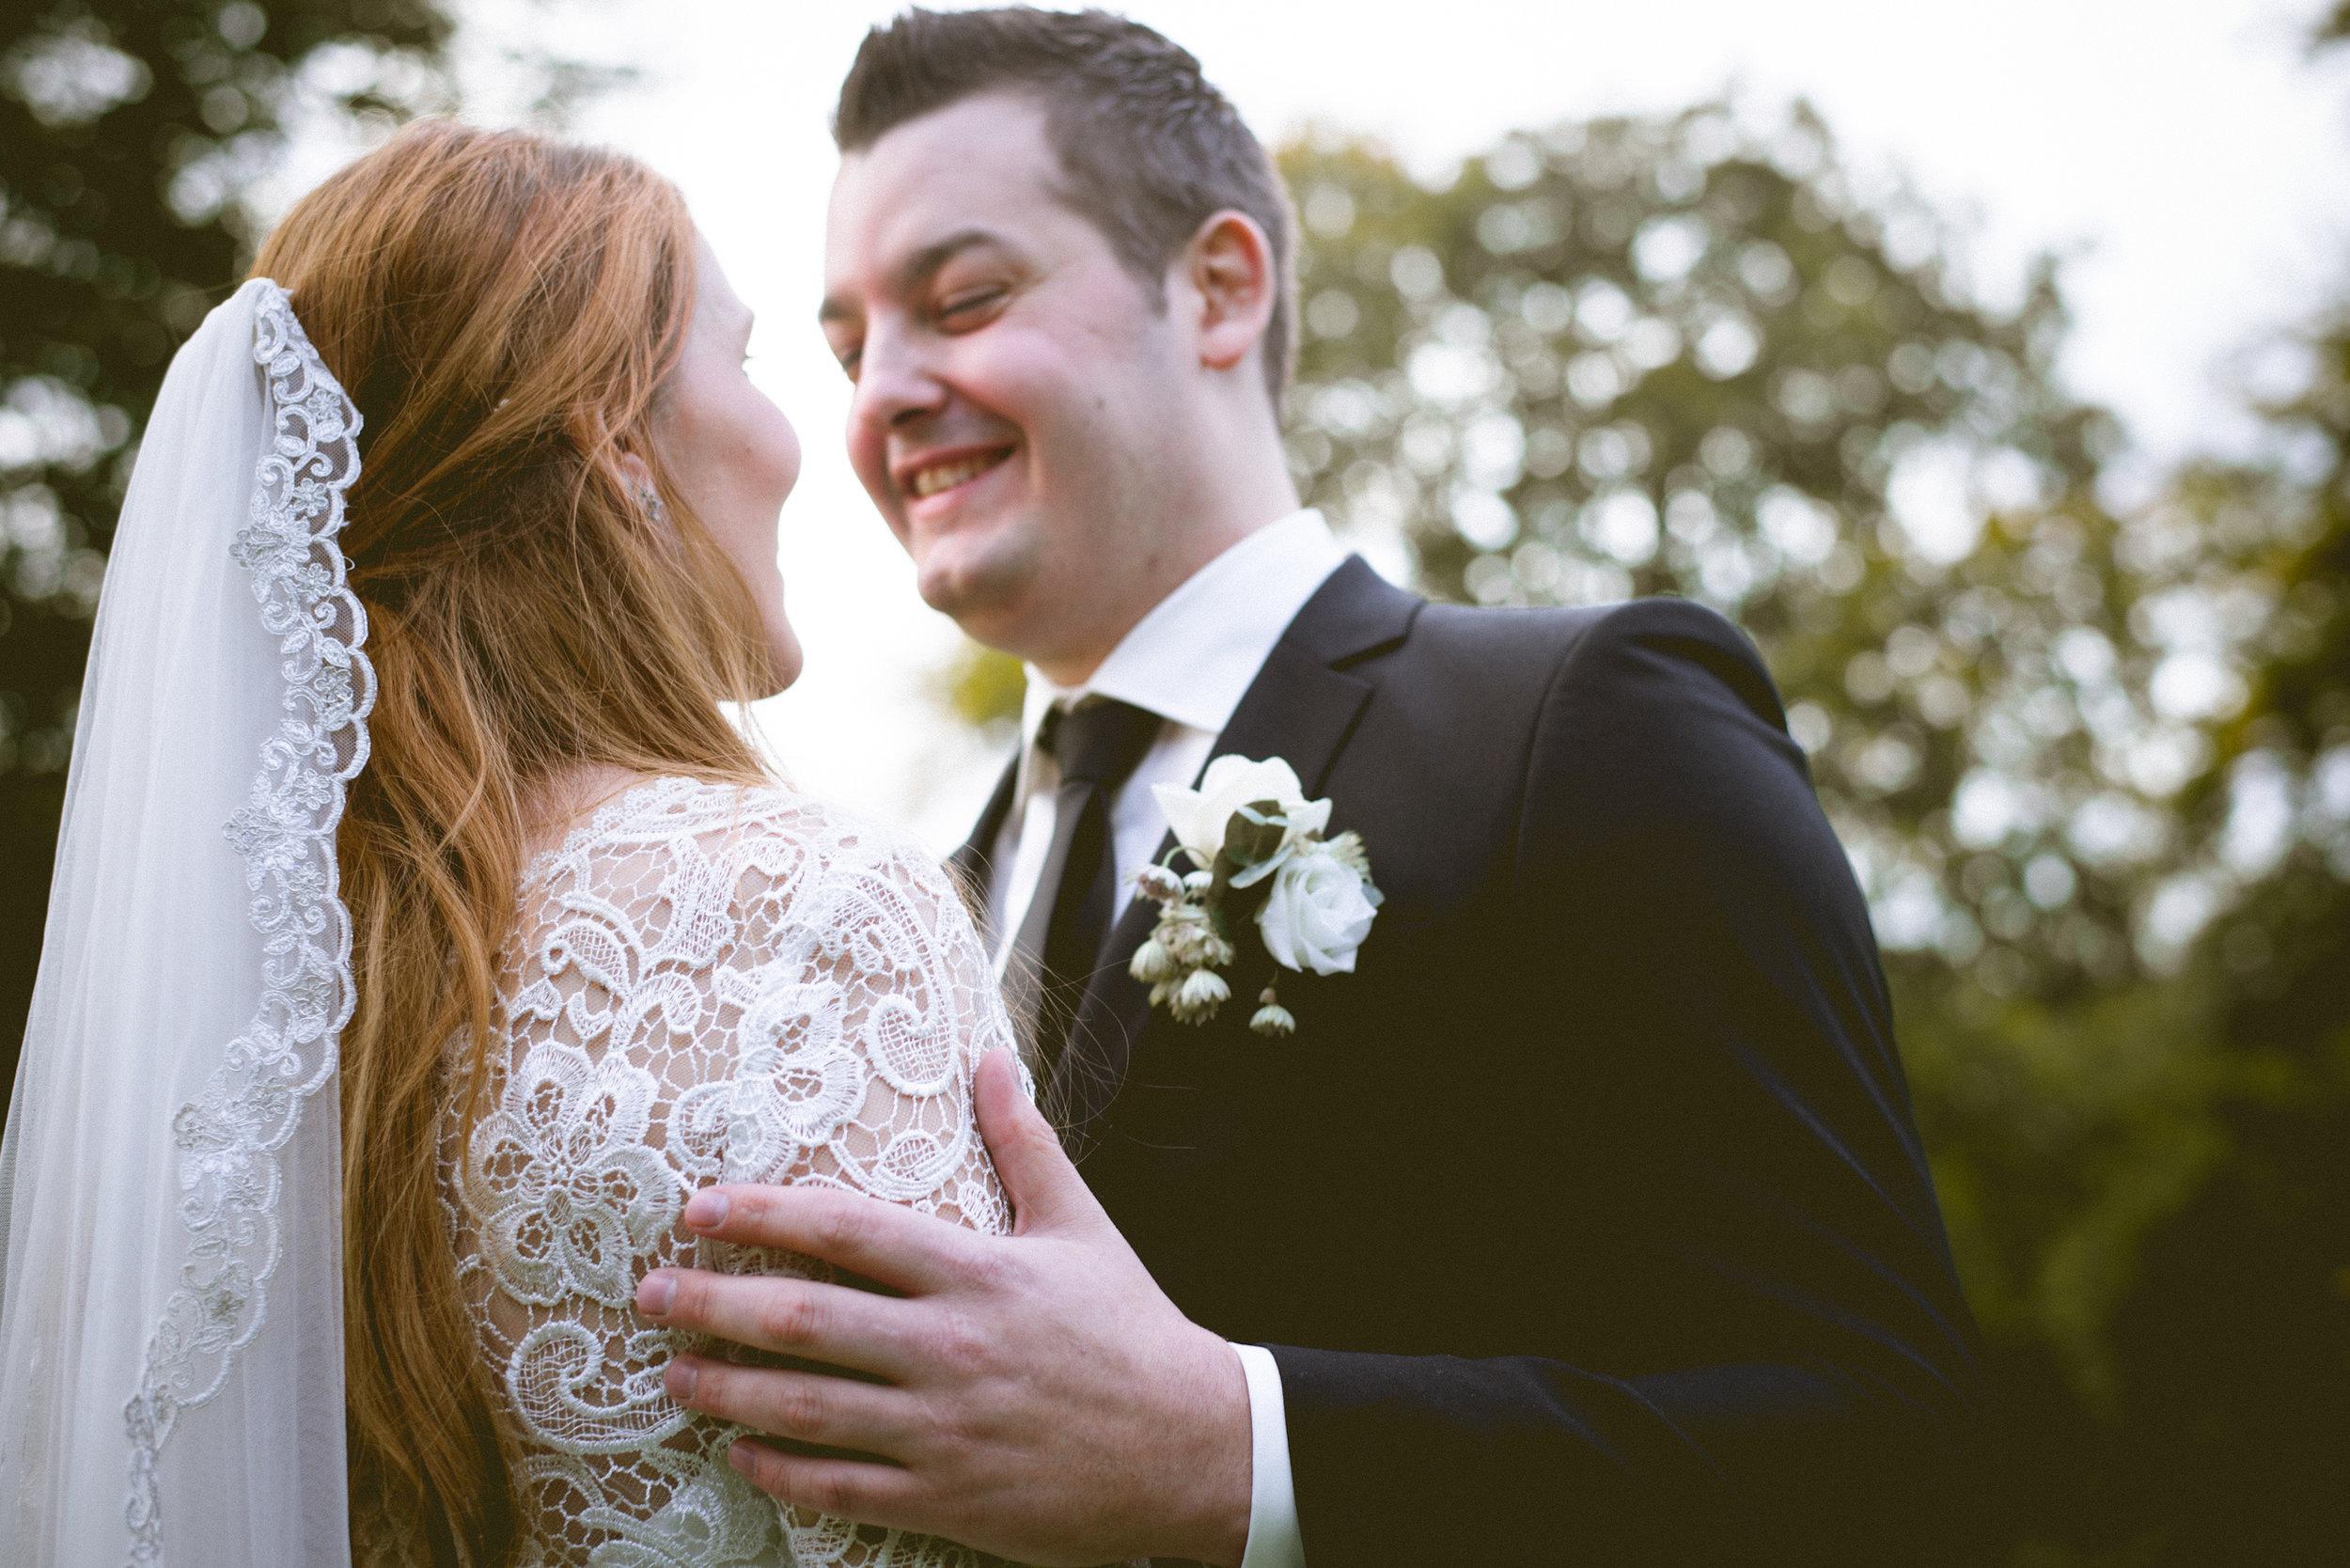 York Region Ontario Wedding Photographer - Bride + Groom-41.jpg